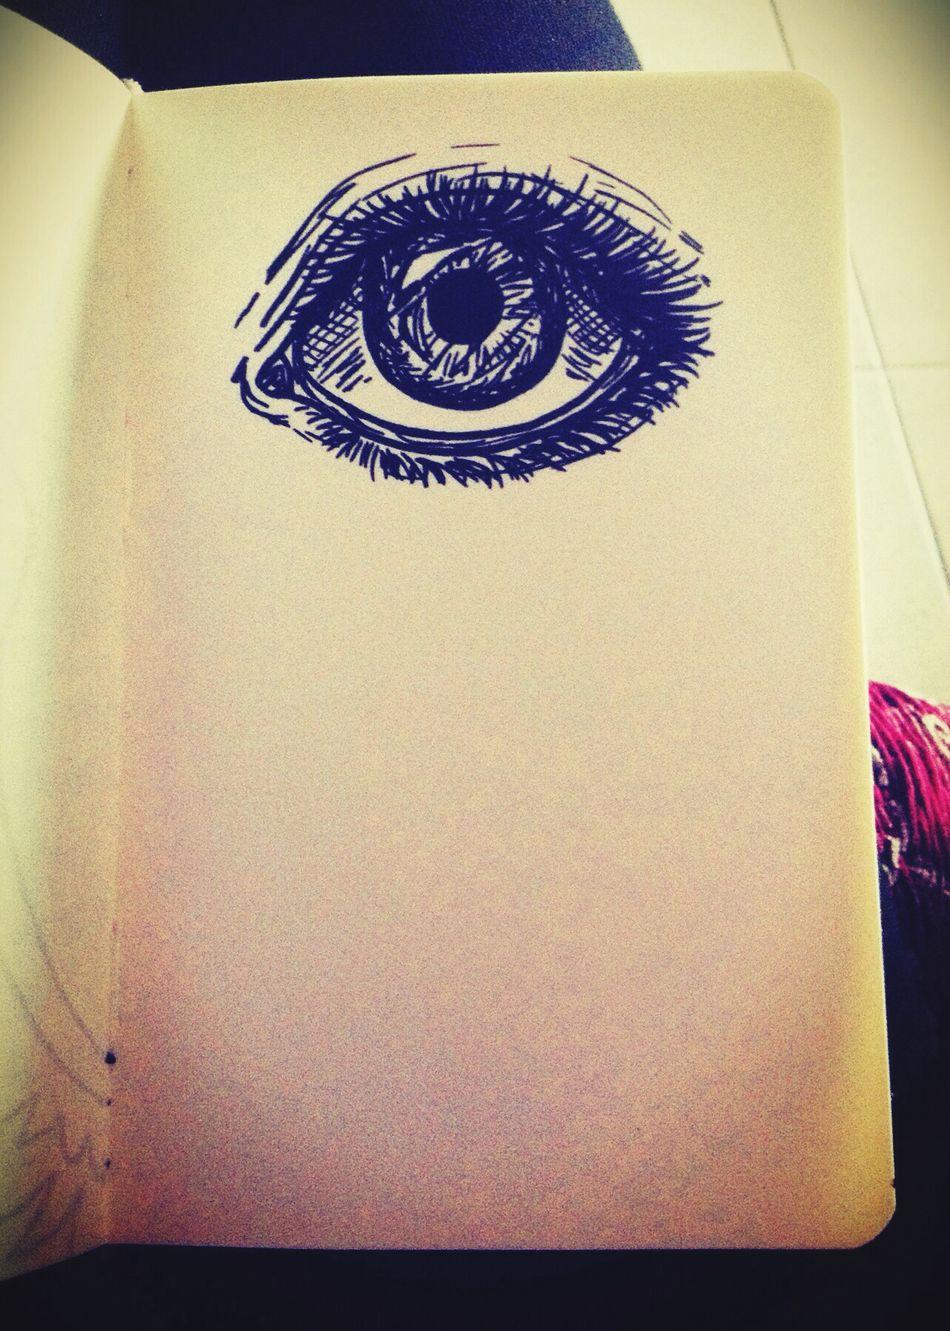 I love drawing soooo much. Drawing Art Eyes Getting Inspired